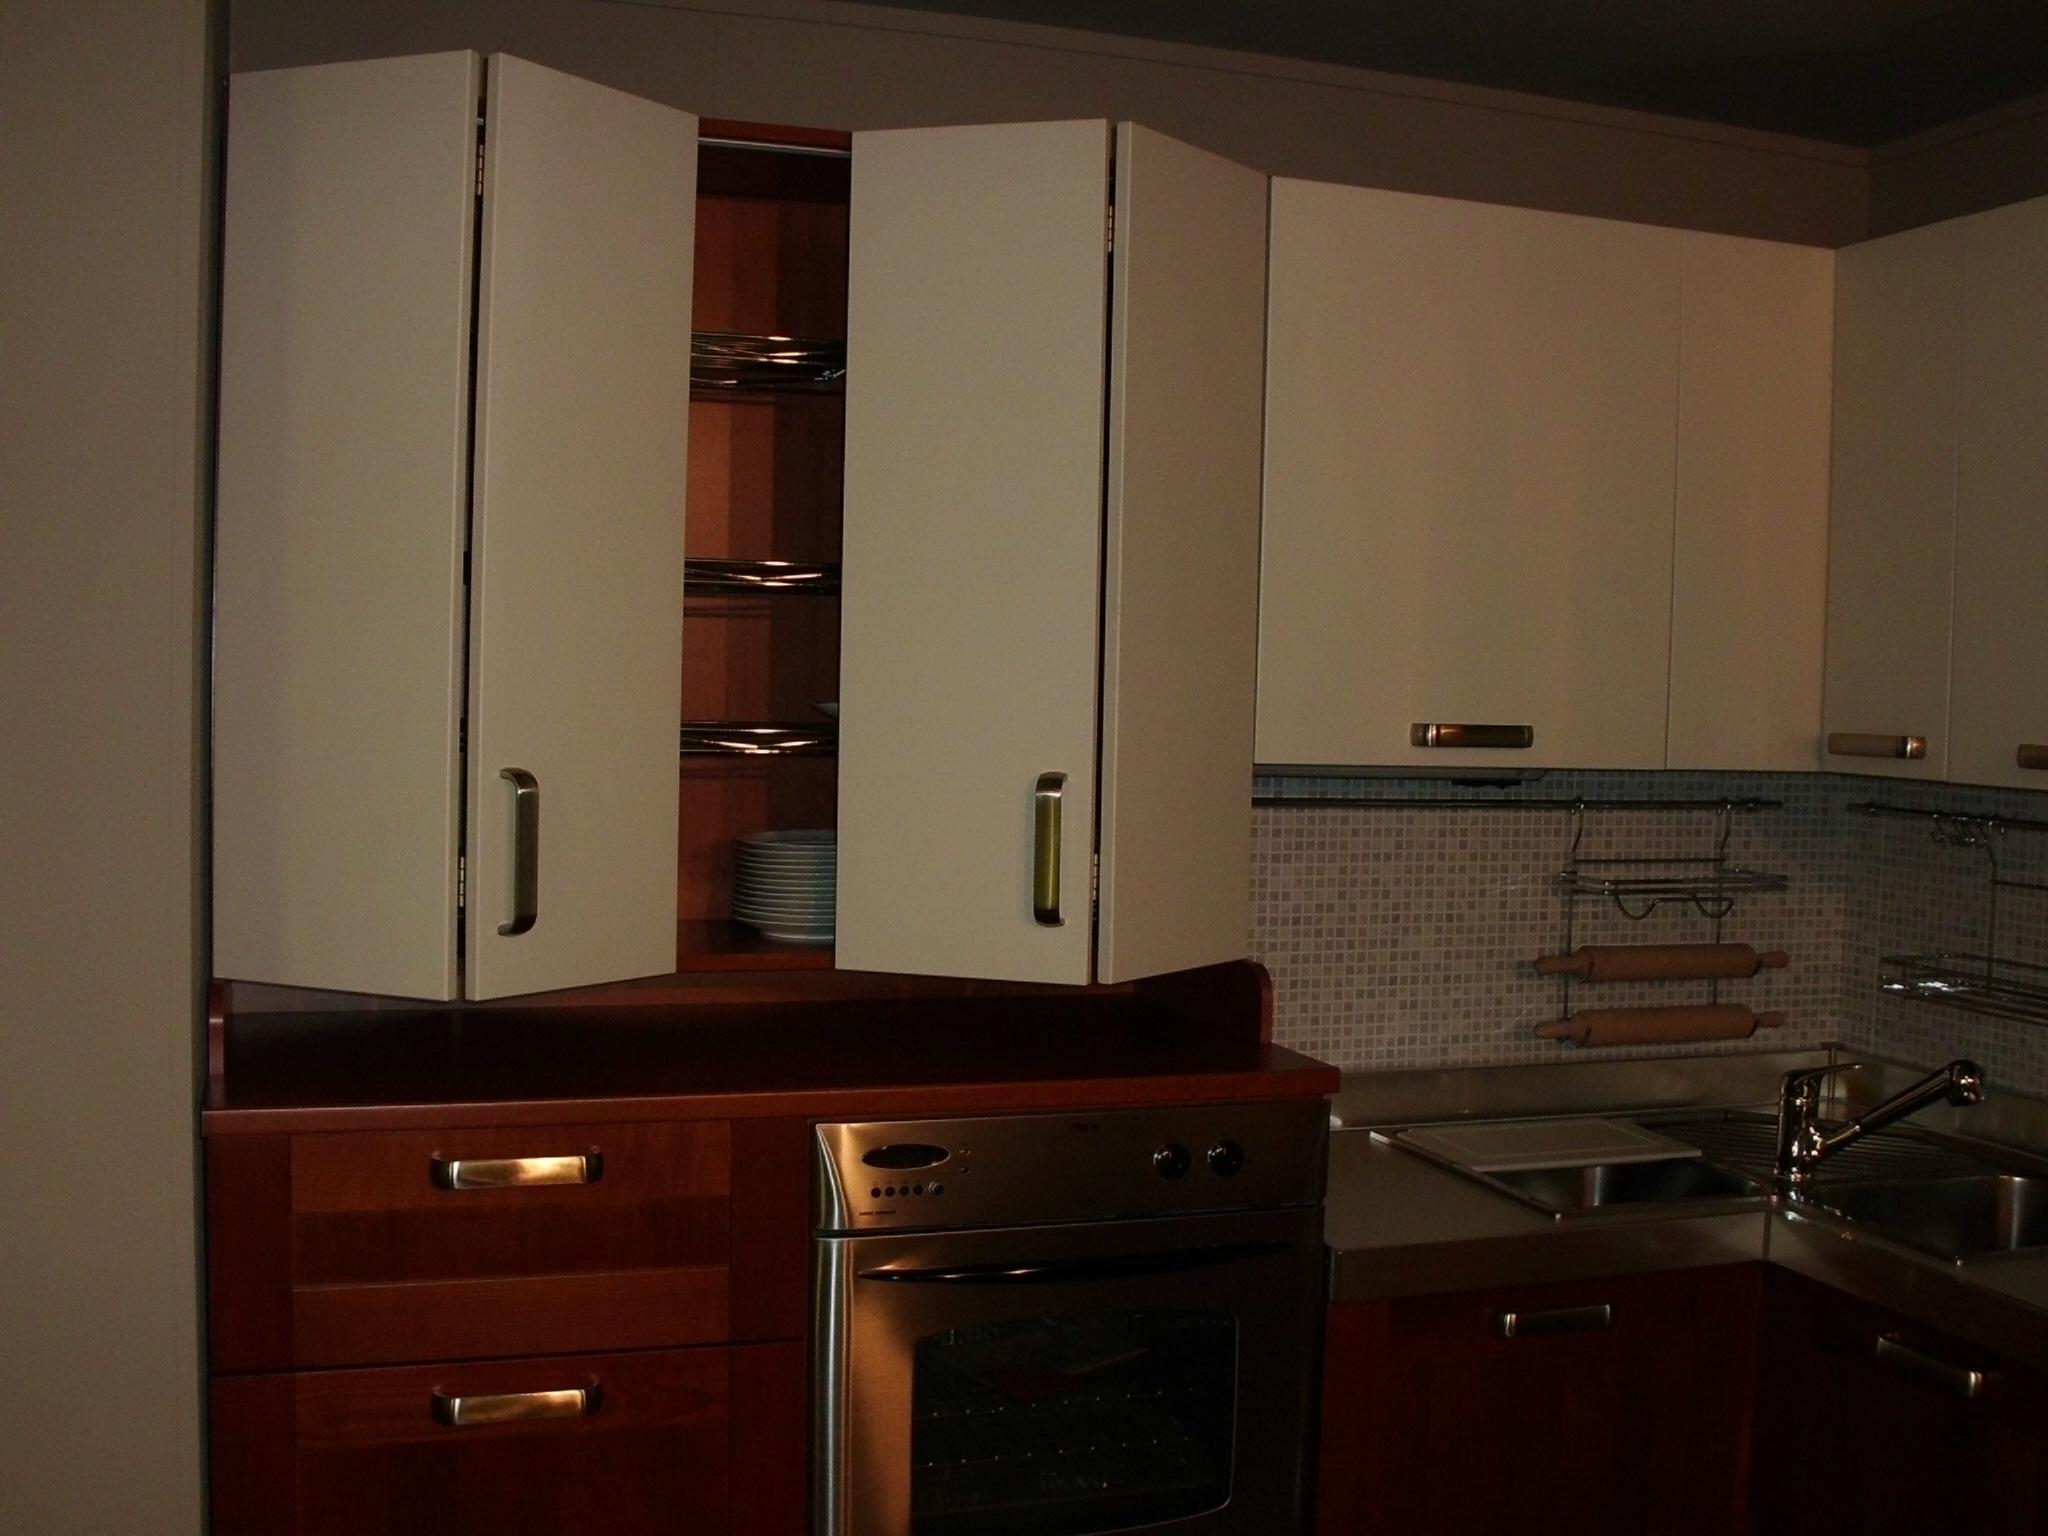 Emejing Cucine Comprex Prezzi Photos - harrop.us - harrop.us